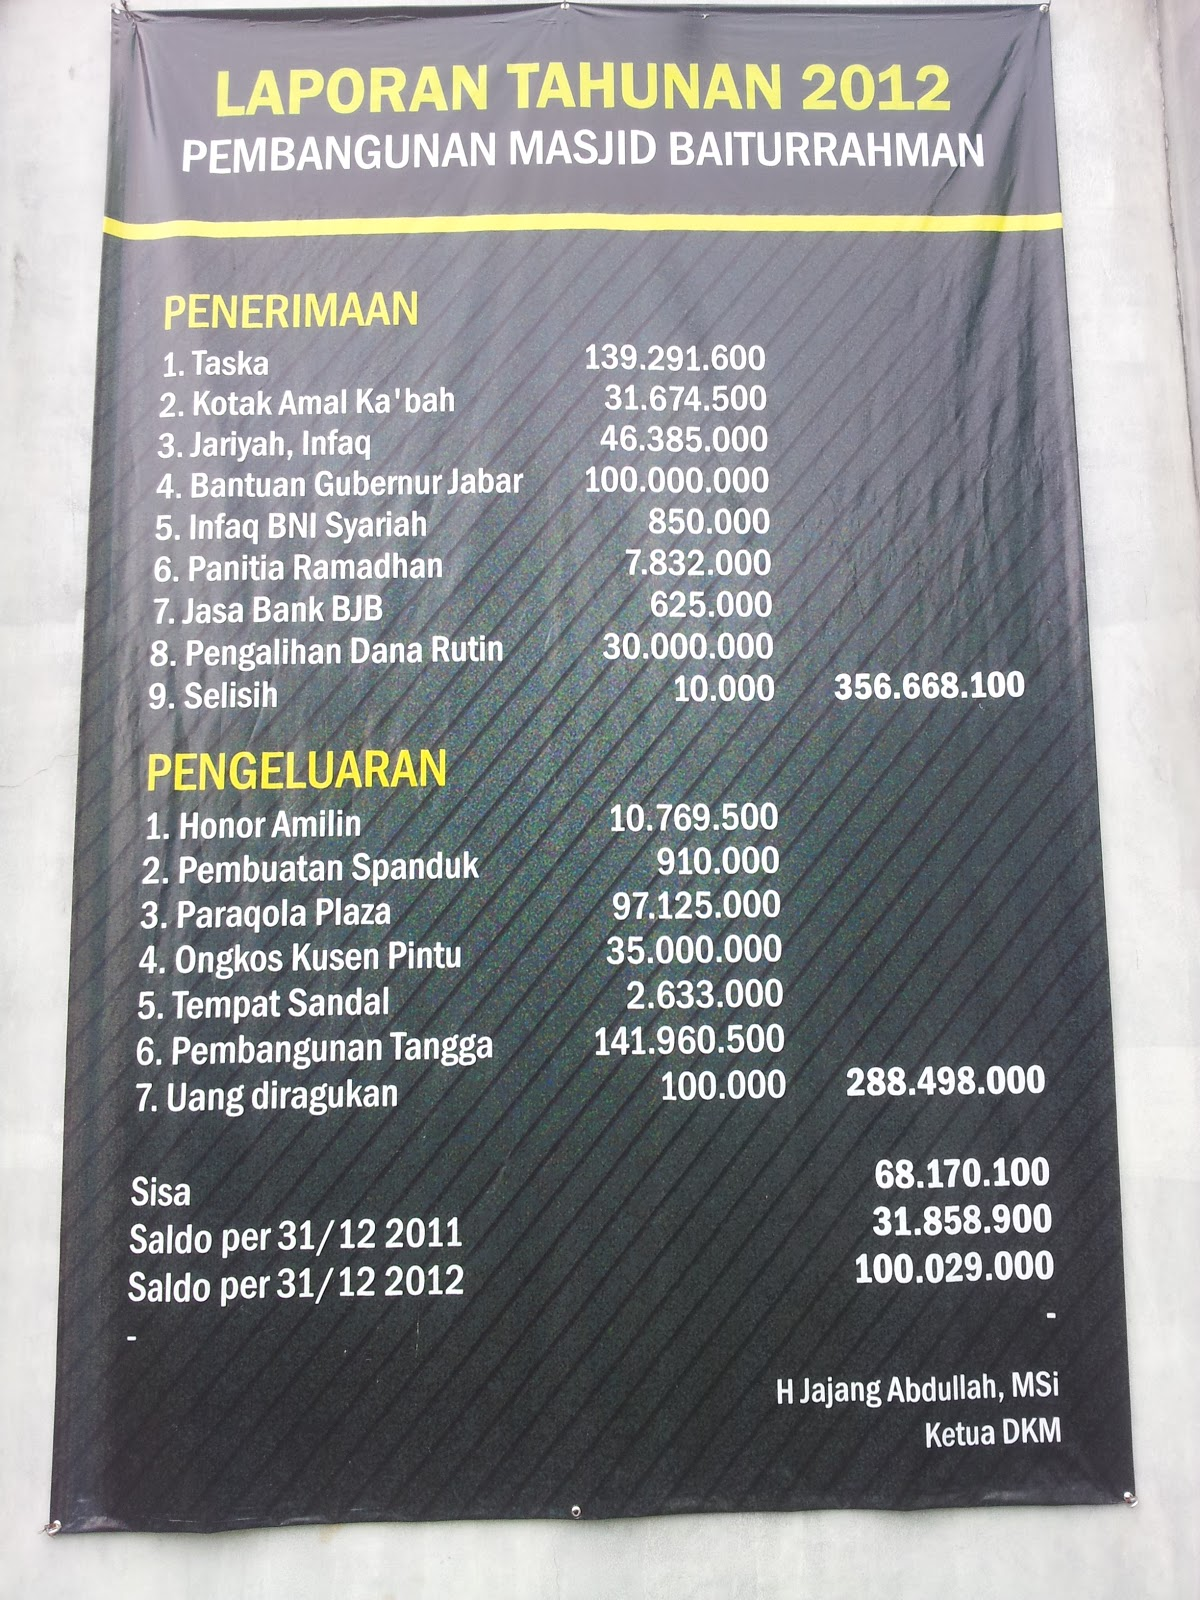 Contoh Laporan Keuangan Masjid Nurul Iman